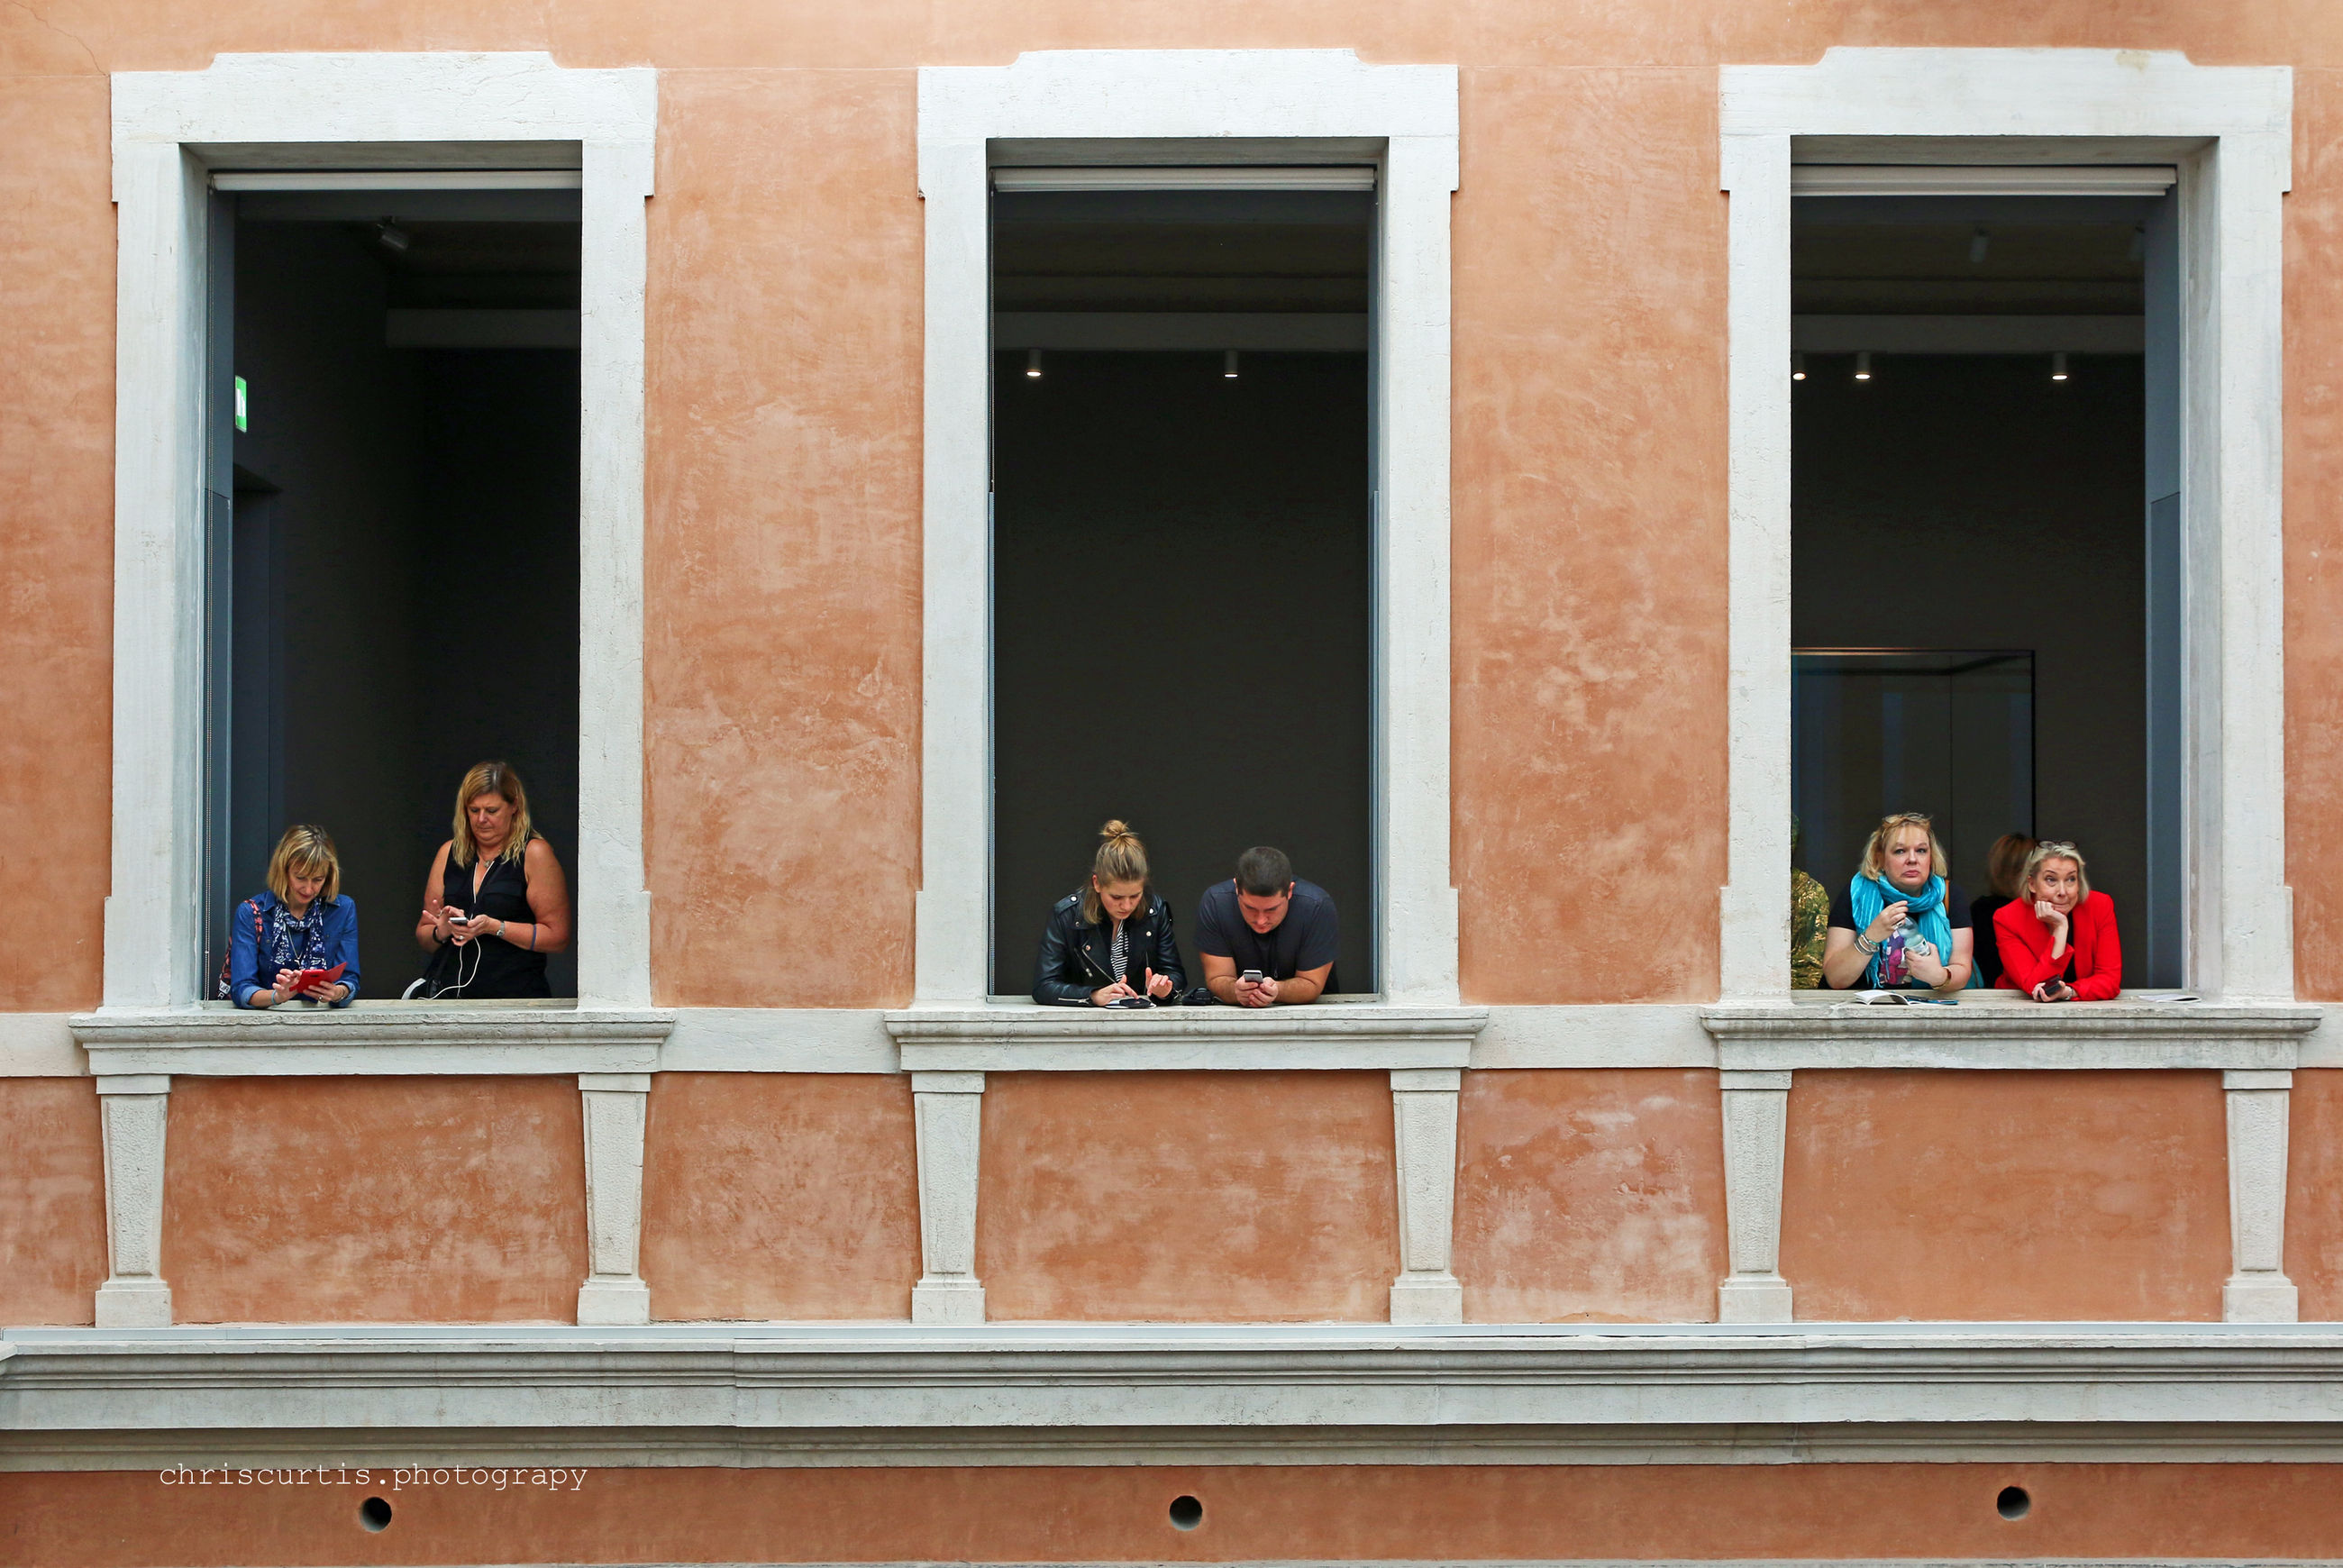 PEOPLE USING PHONE ON WINDOW